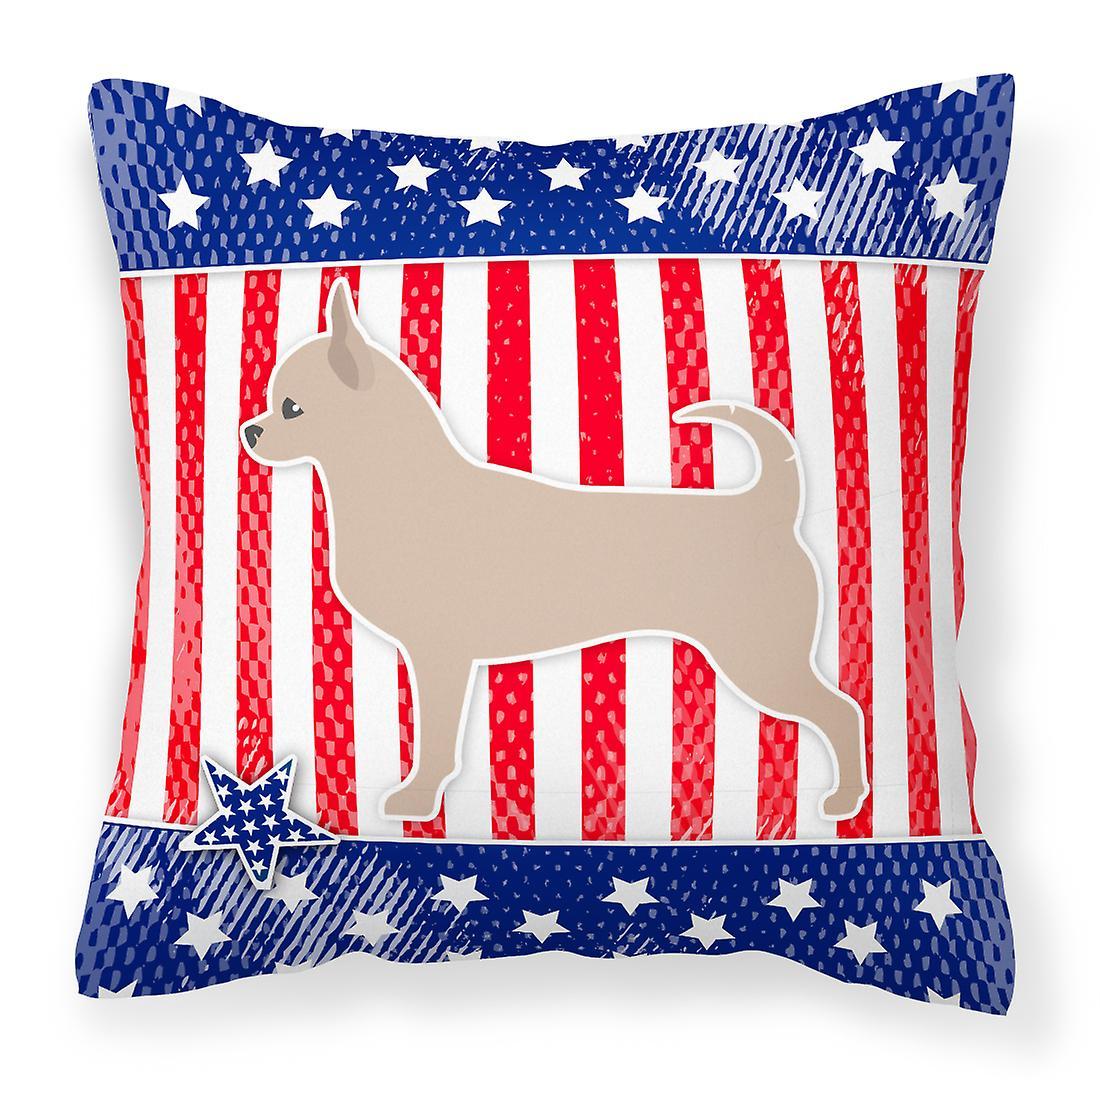 Patriotique Tissu Décoratif Chihuahua Usa Oreiller UVzMqpLSG